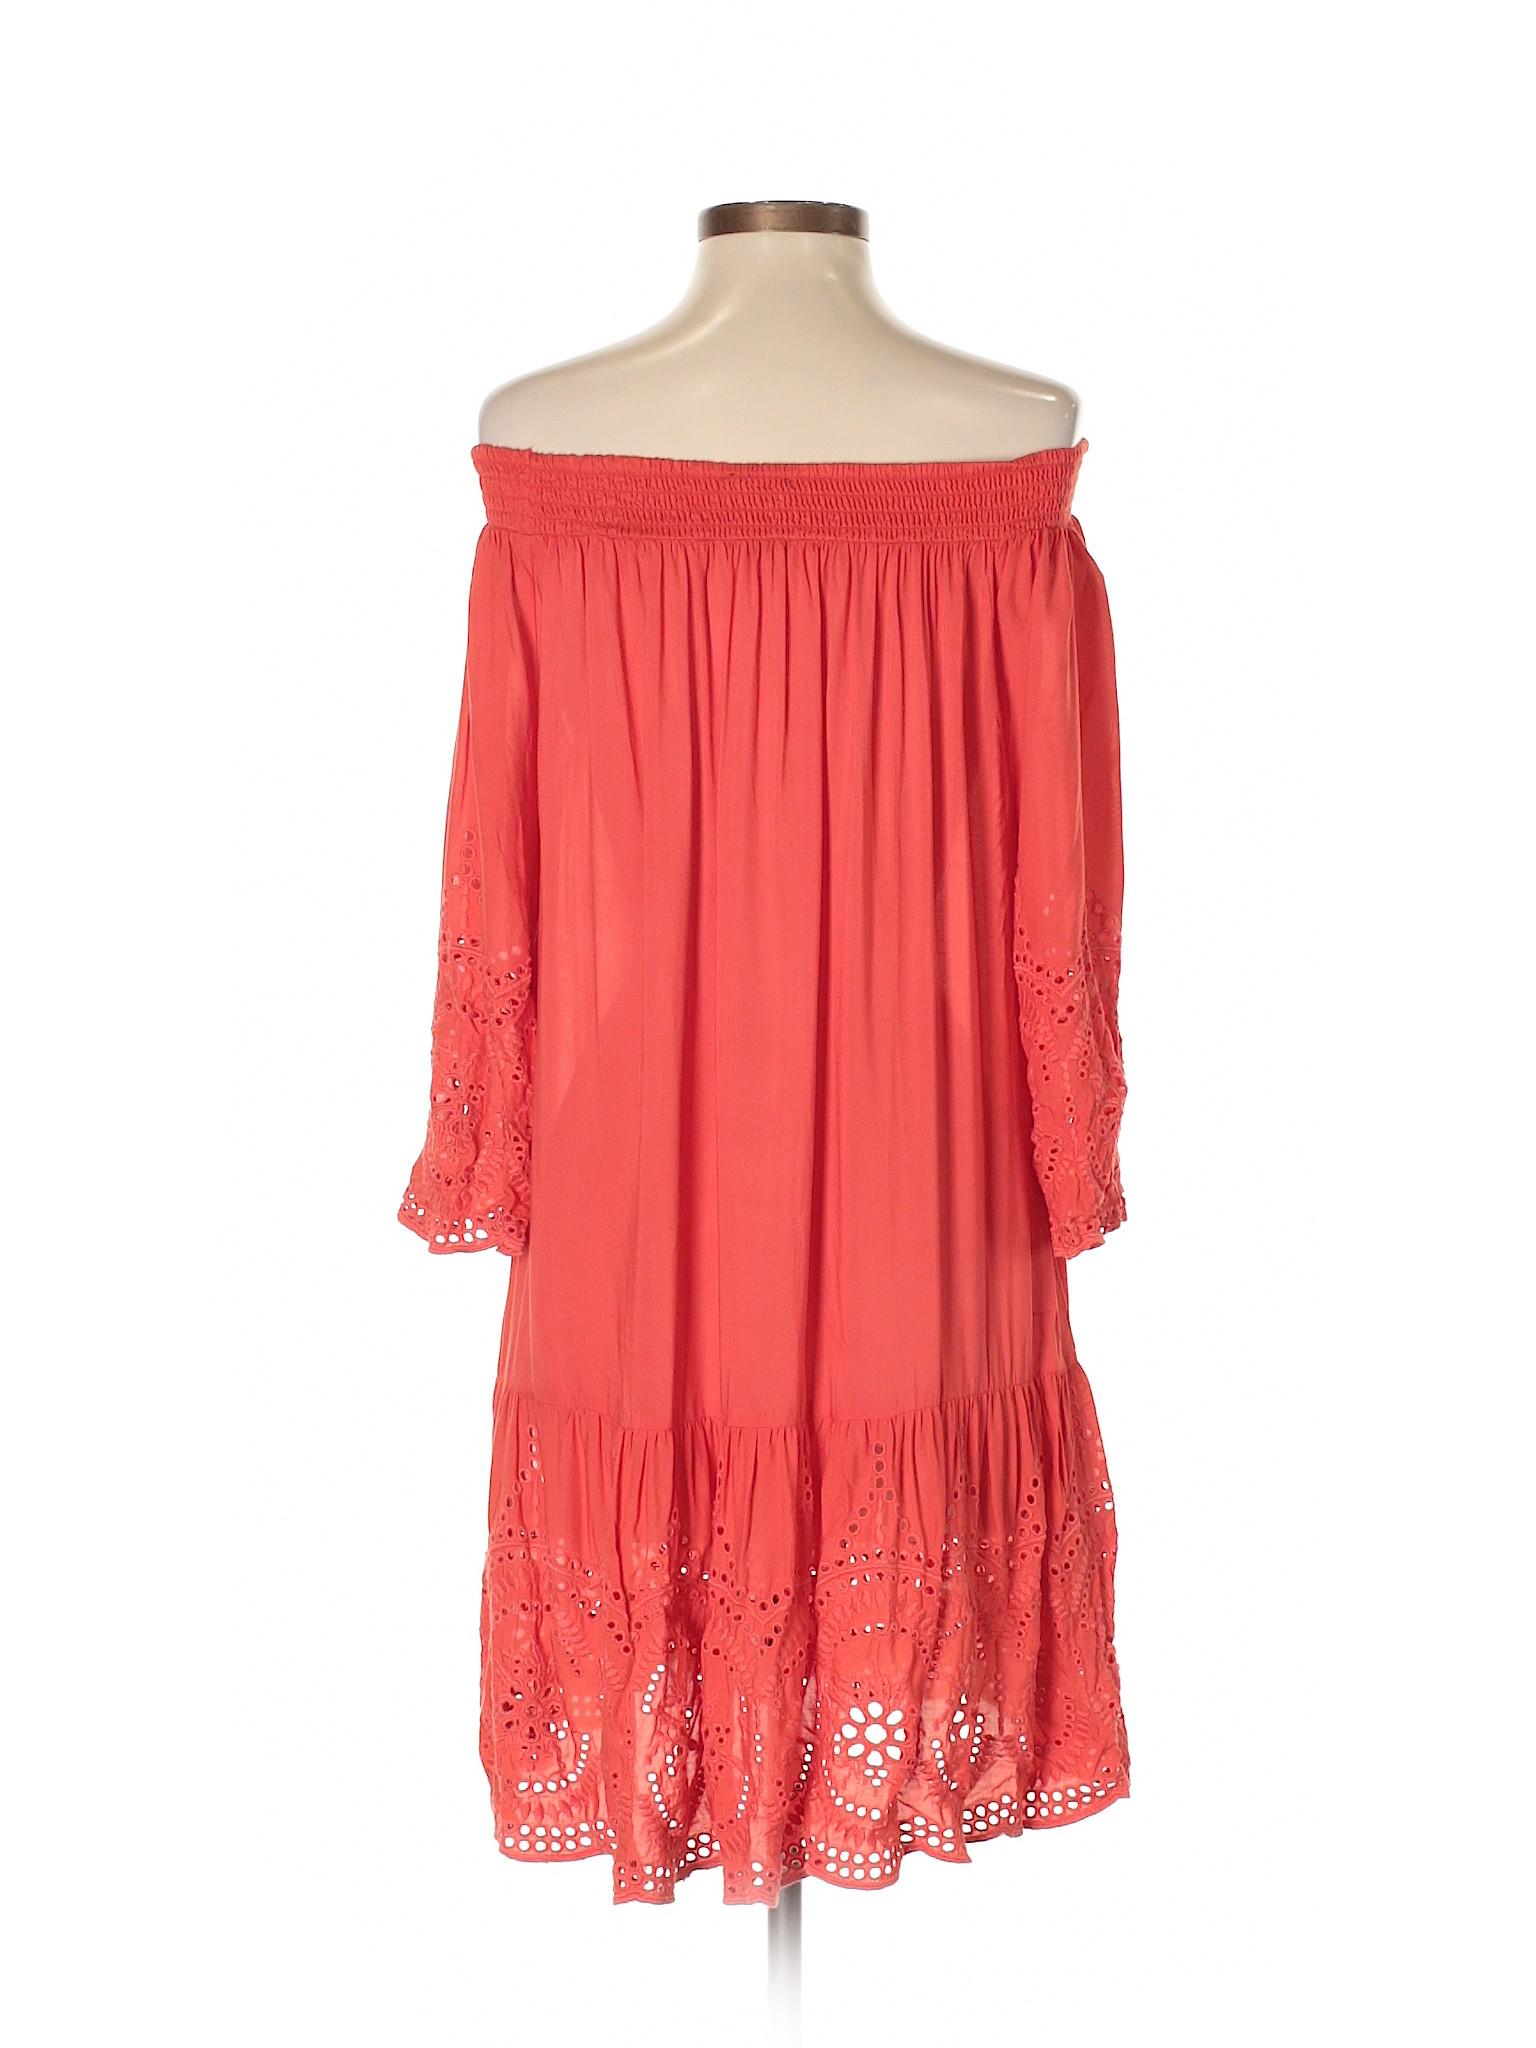 Theodore Boutique Dress Chelsea amp; Casual winter UxHZO